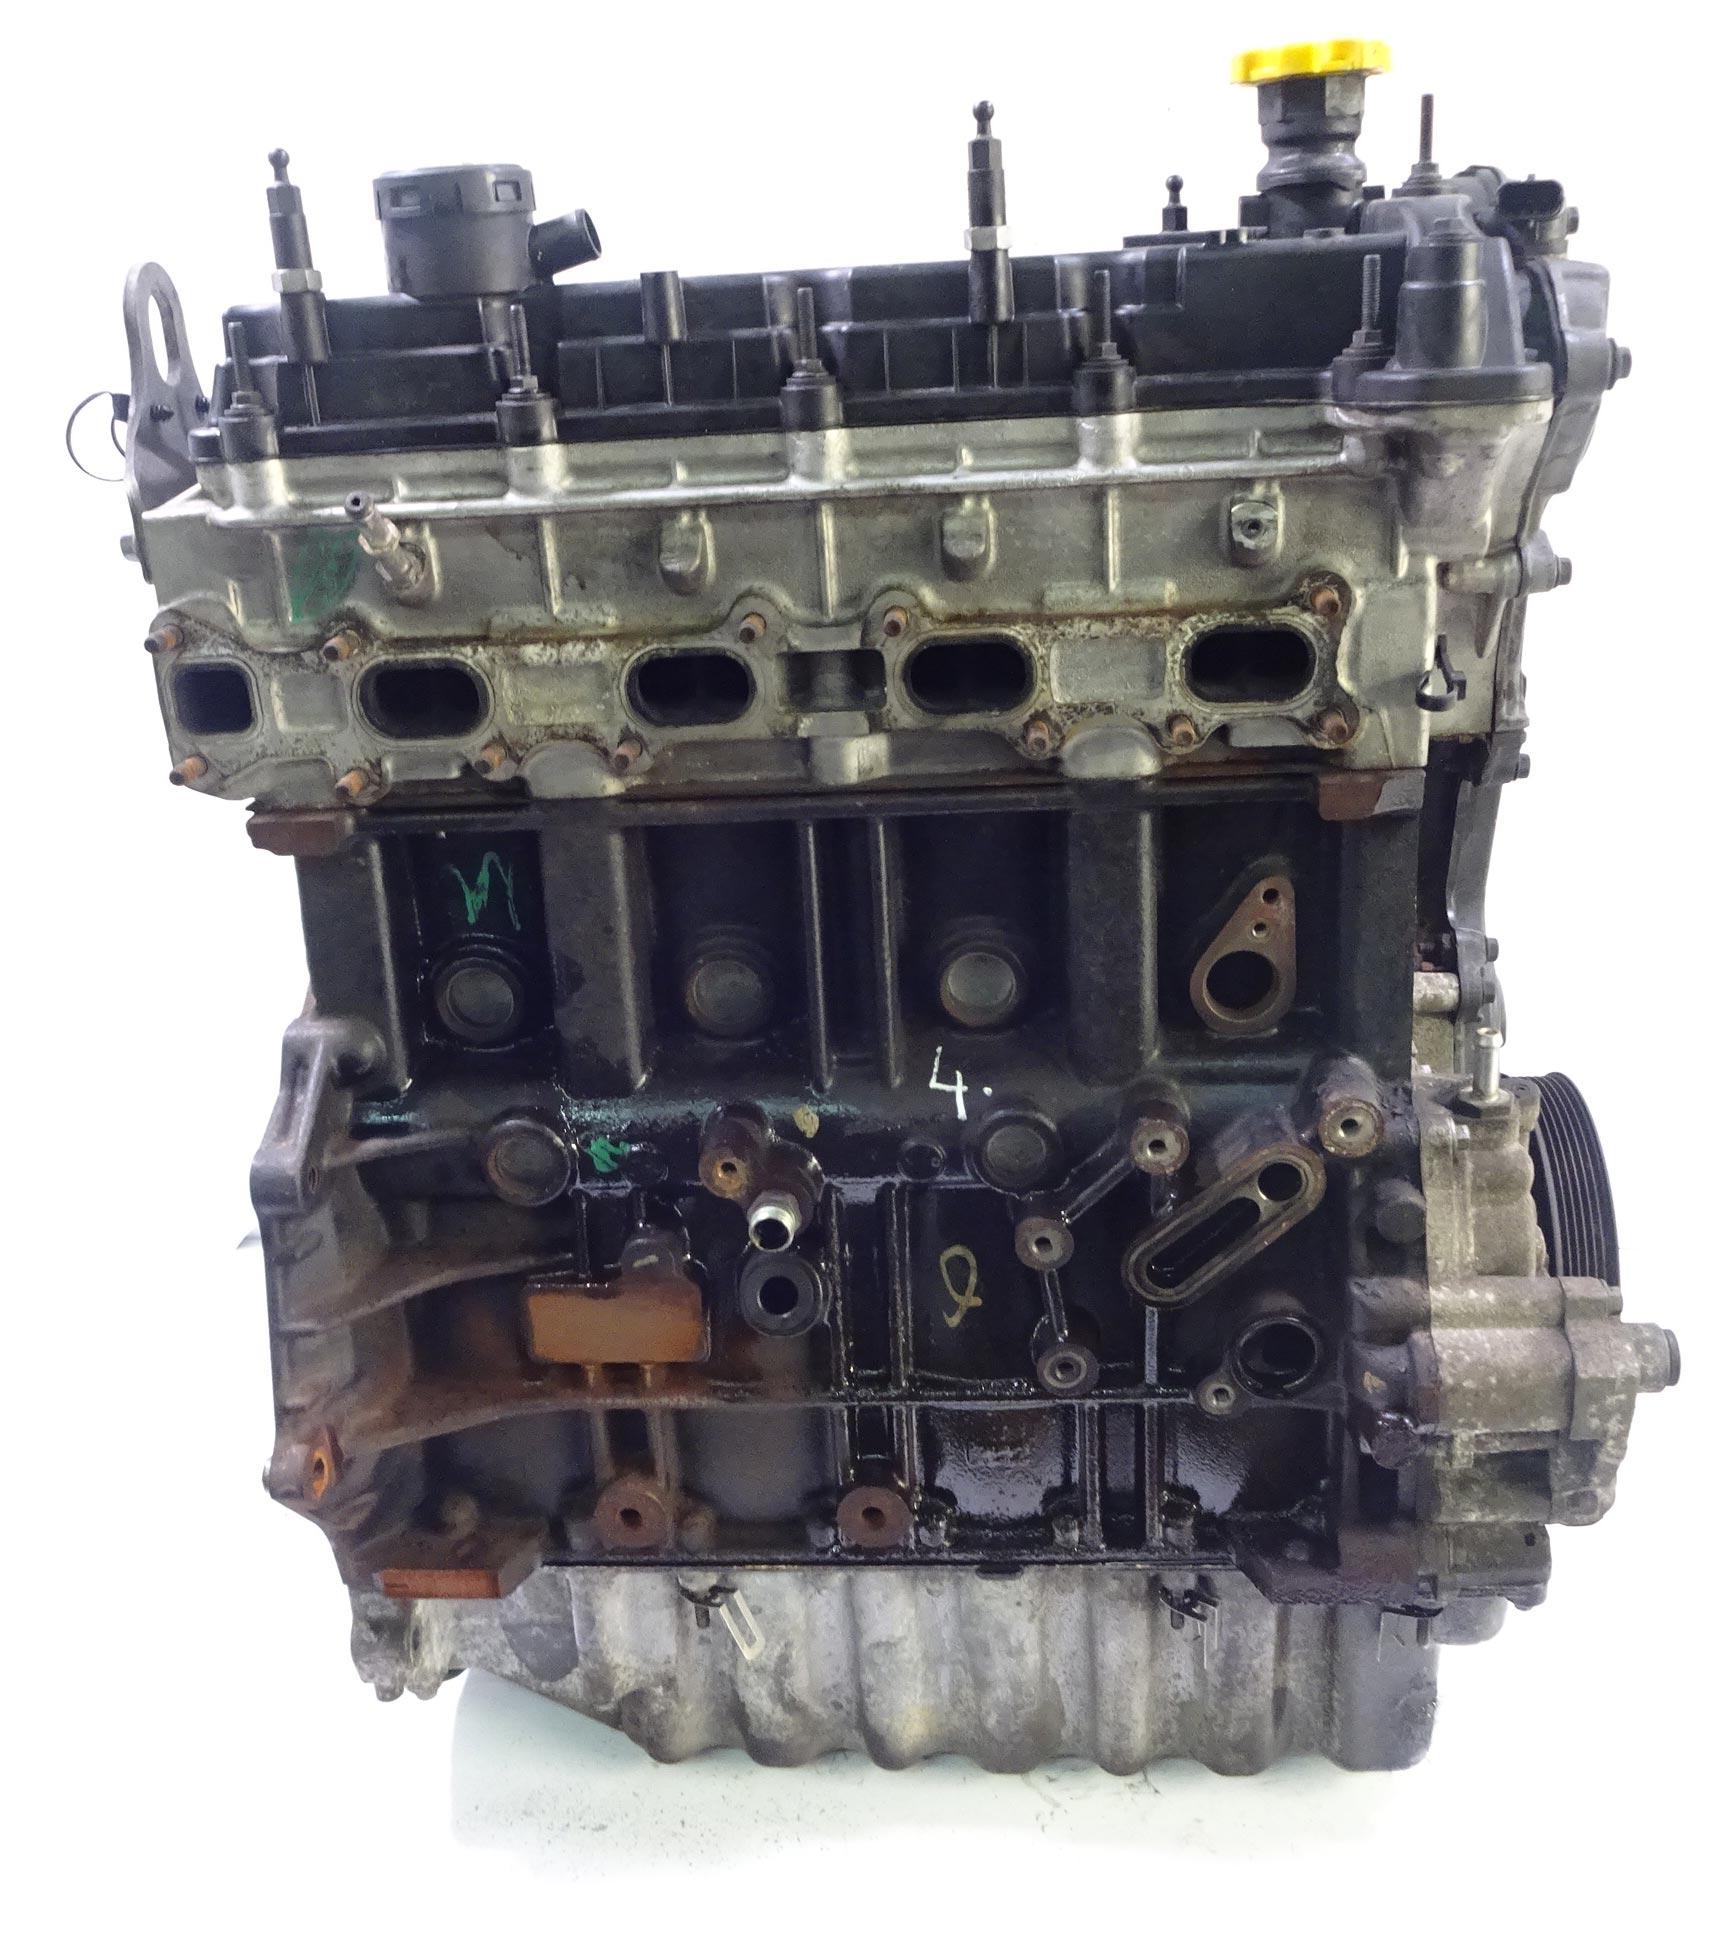 Motor 2009 Chrysler 2,8 CRD Diesel VM64 VM64C 163 PS